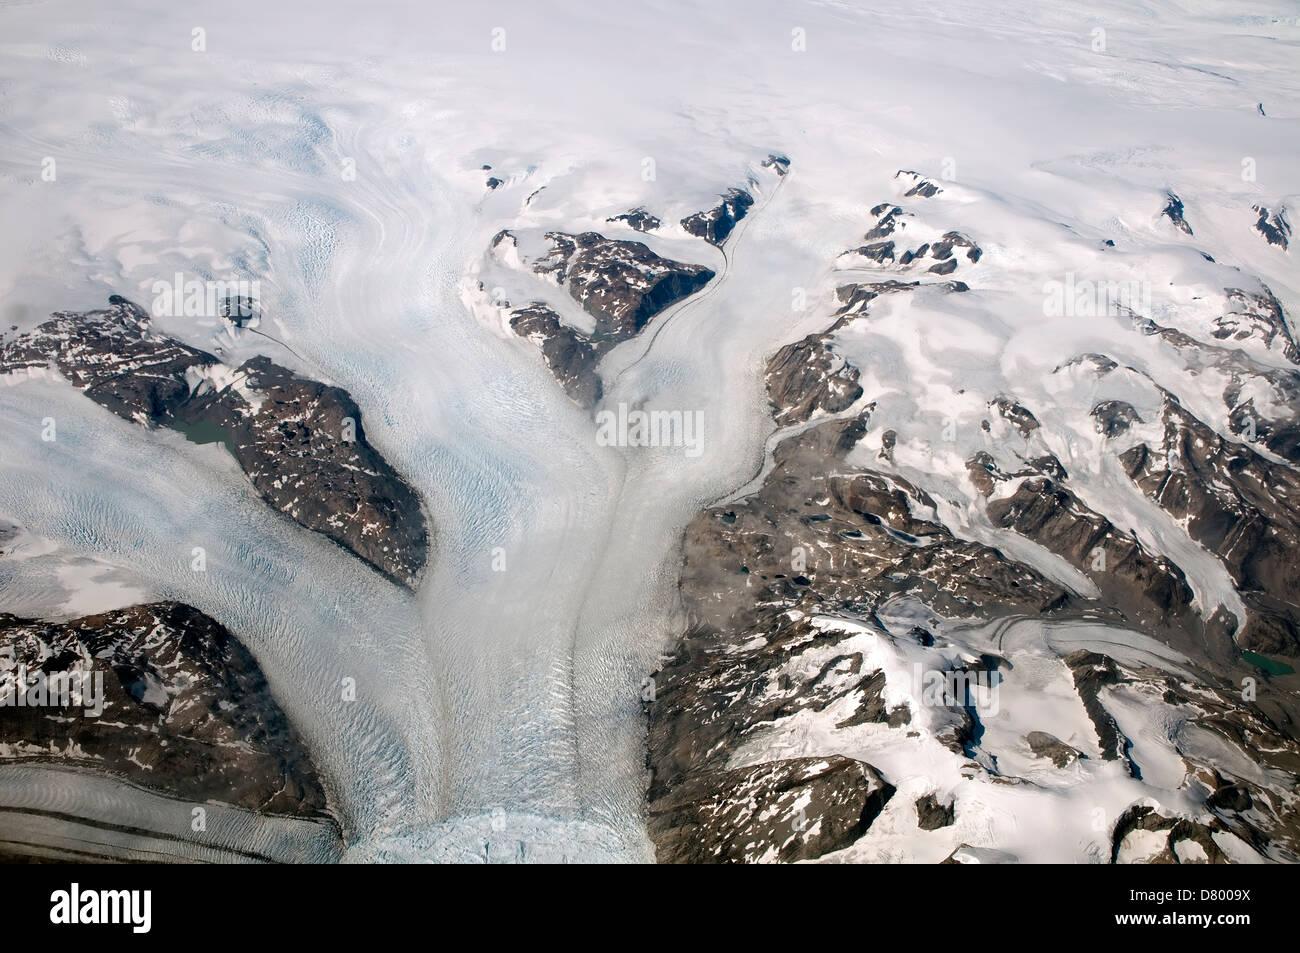 Greenland Glaciers - Stock Image